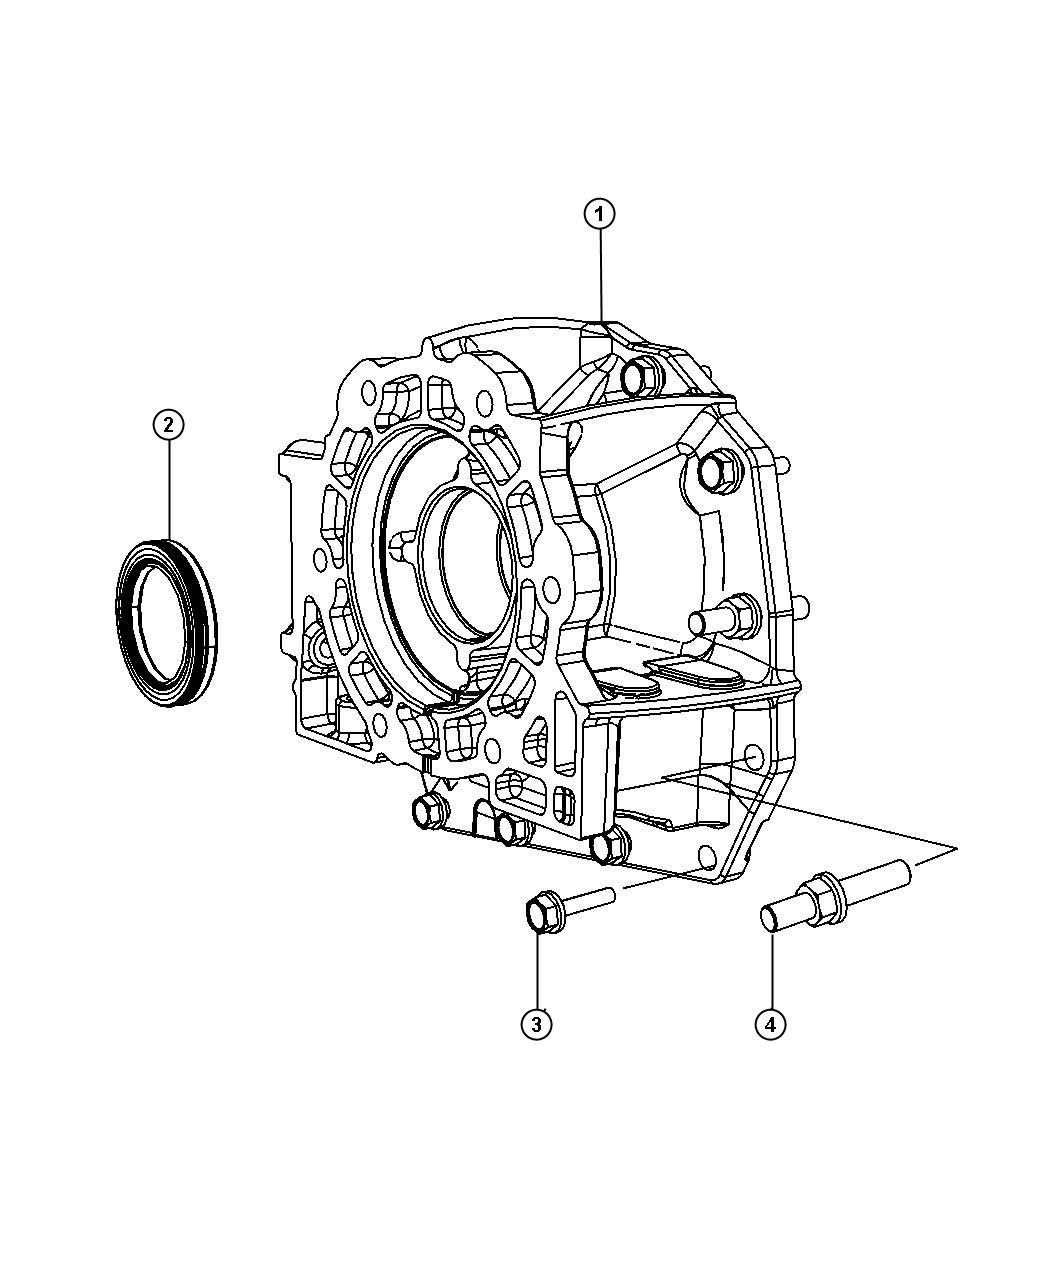 Dodge Adapter Transfer Case Transmissionmultispeed